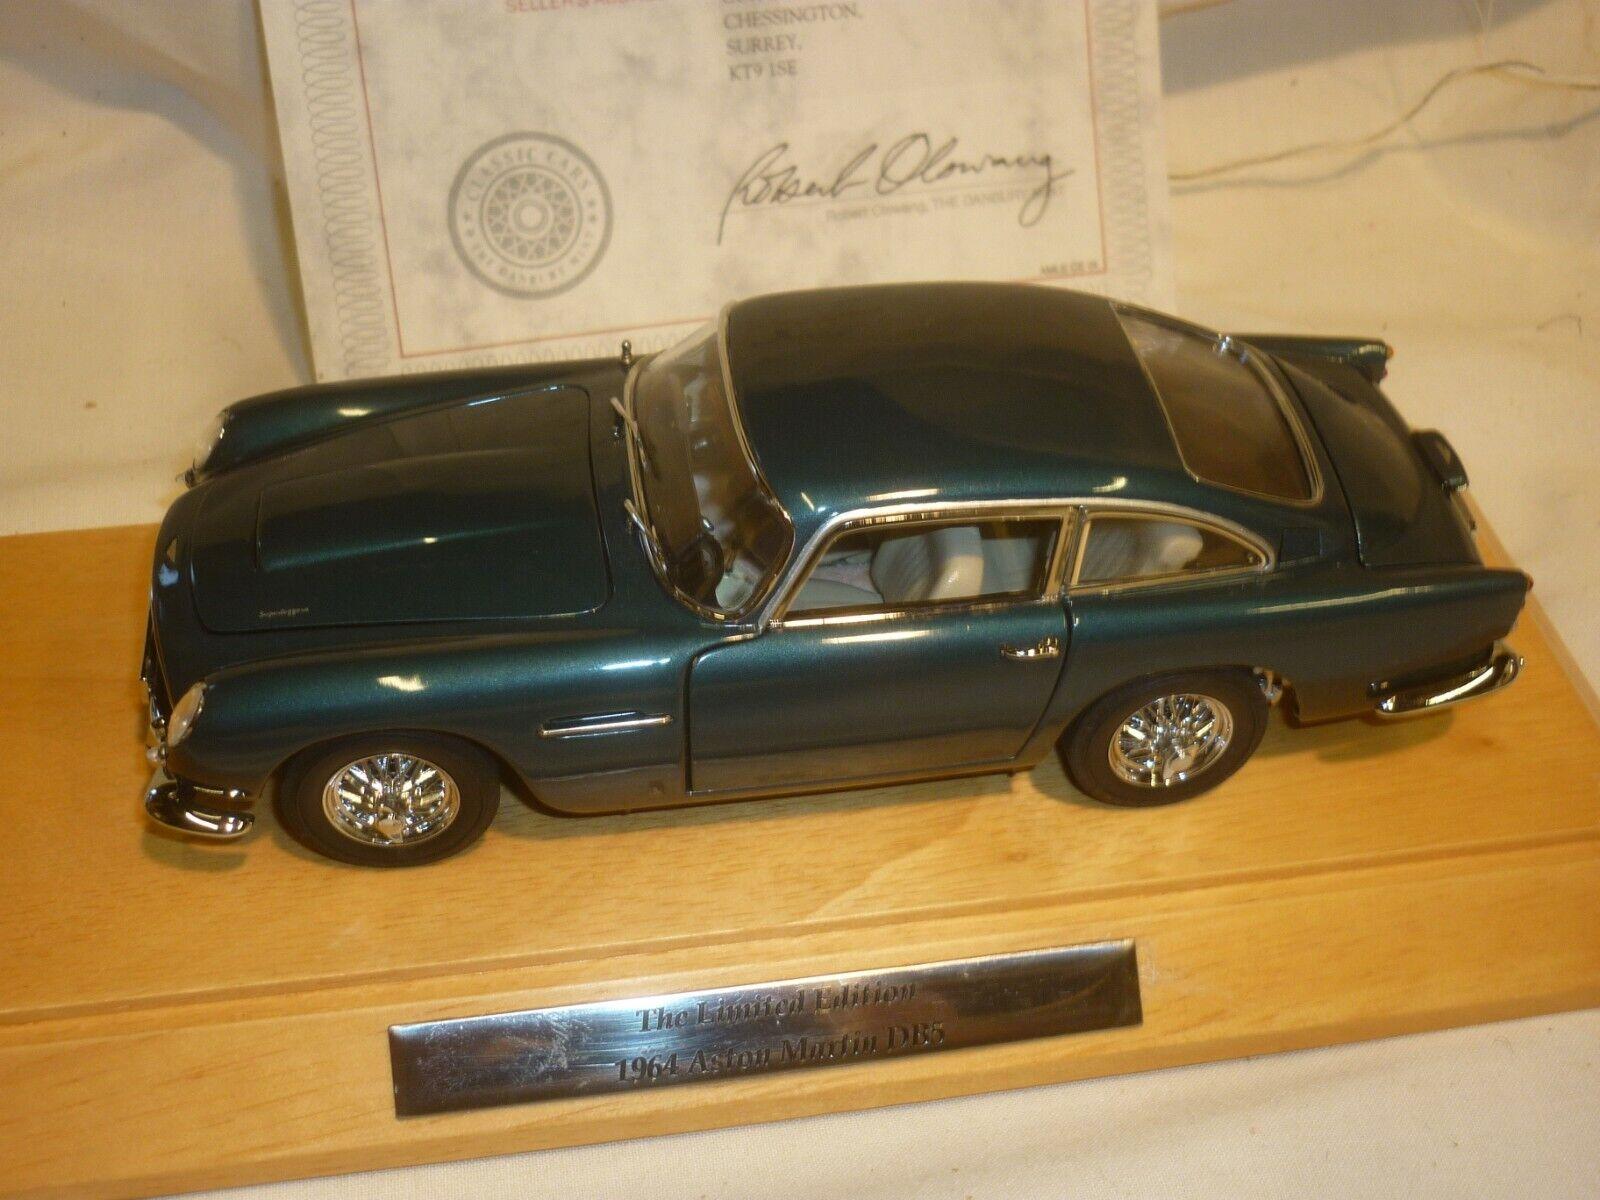 la mejor selección de Un Danbury Danbury Danbury Mint de un modelo a escala de un 1964 Aston Martin DB5 Con Caja Claro  ofreciendo 100%